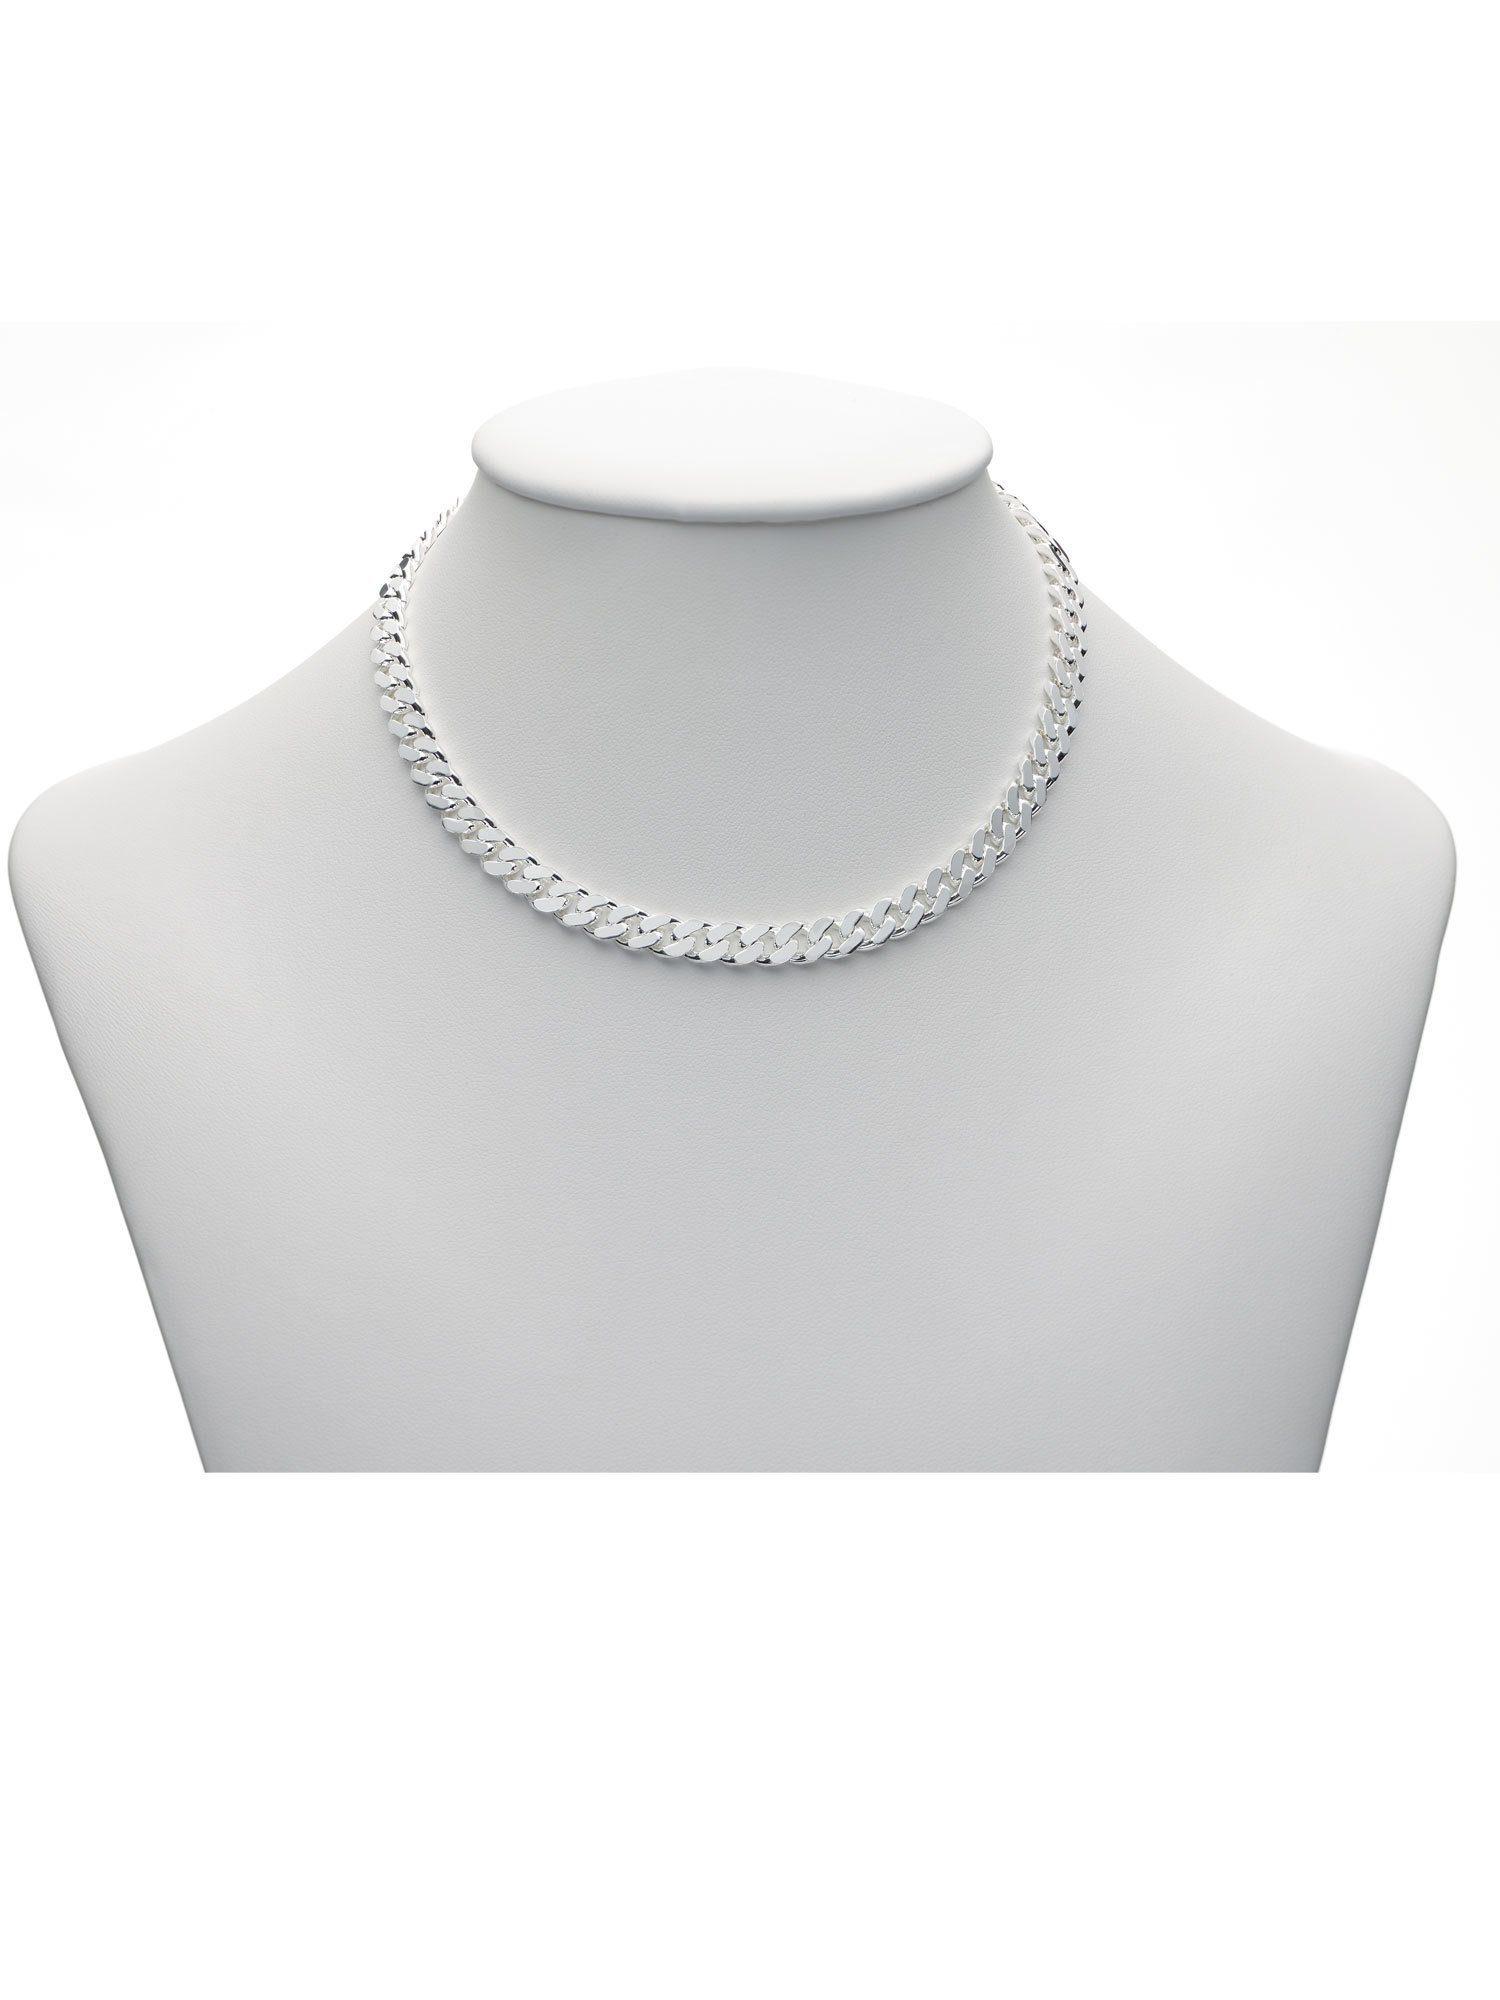 Adelia´s Silberkette »Silber 925 Sterling Silver Halskette - Collier« 925 Sterling Silber Flach Panzerkette